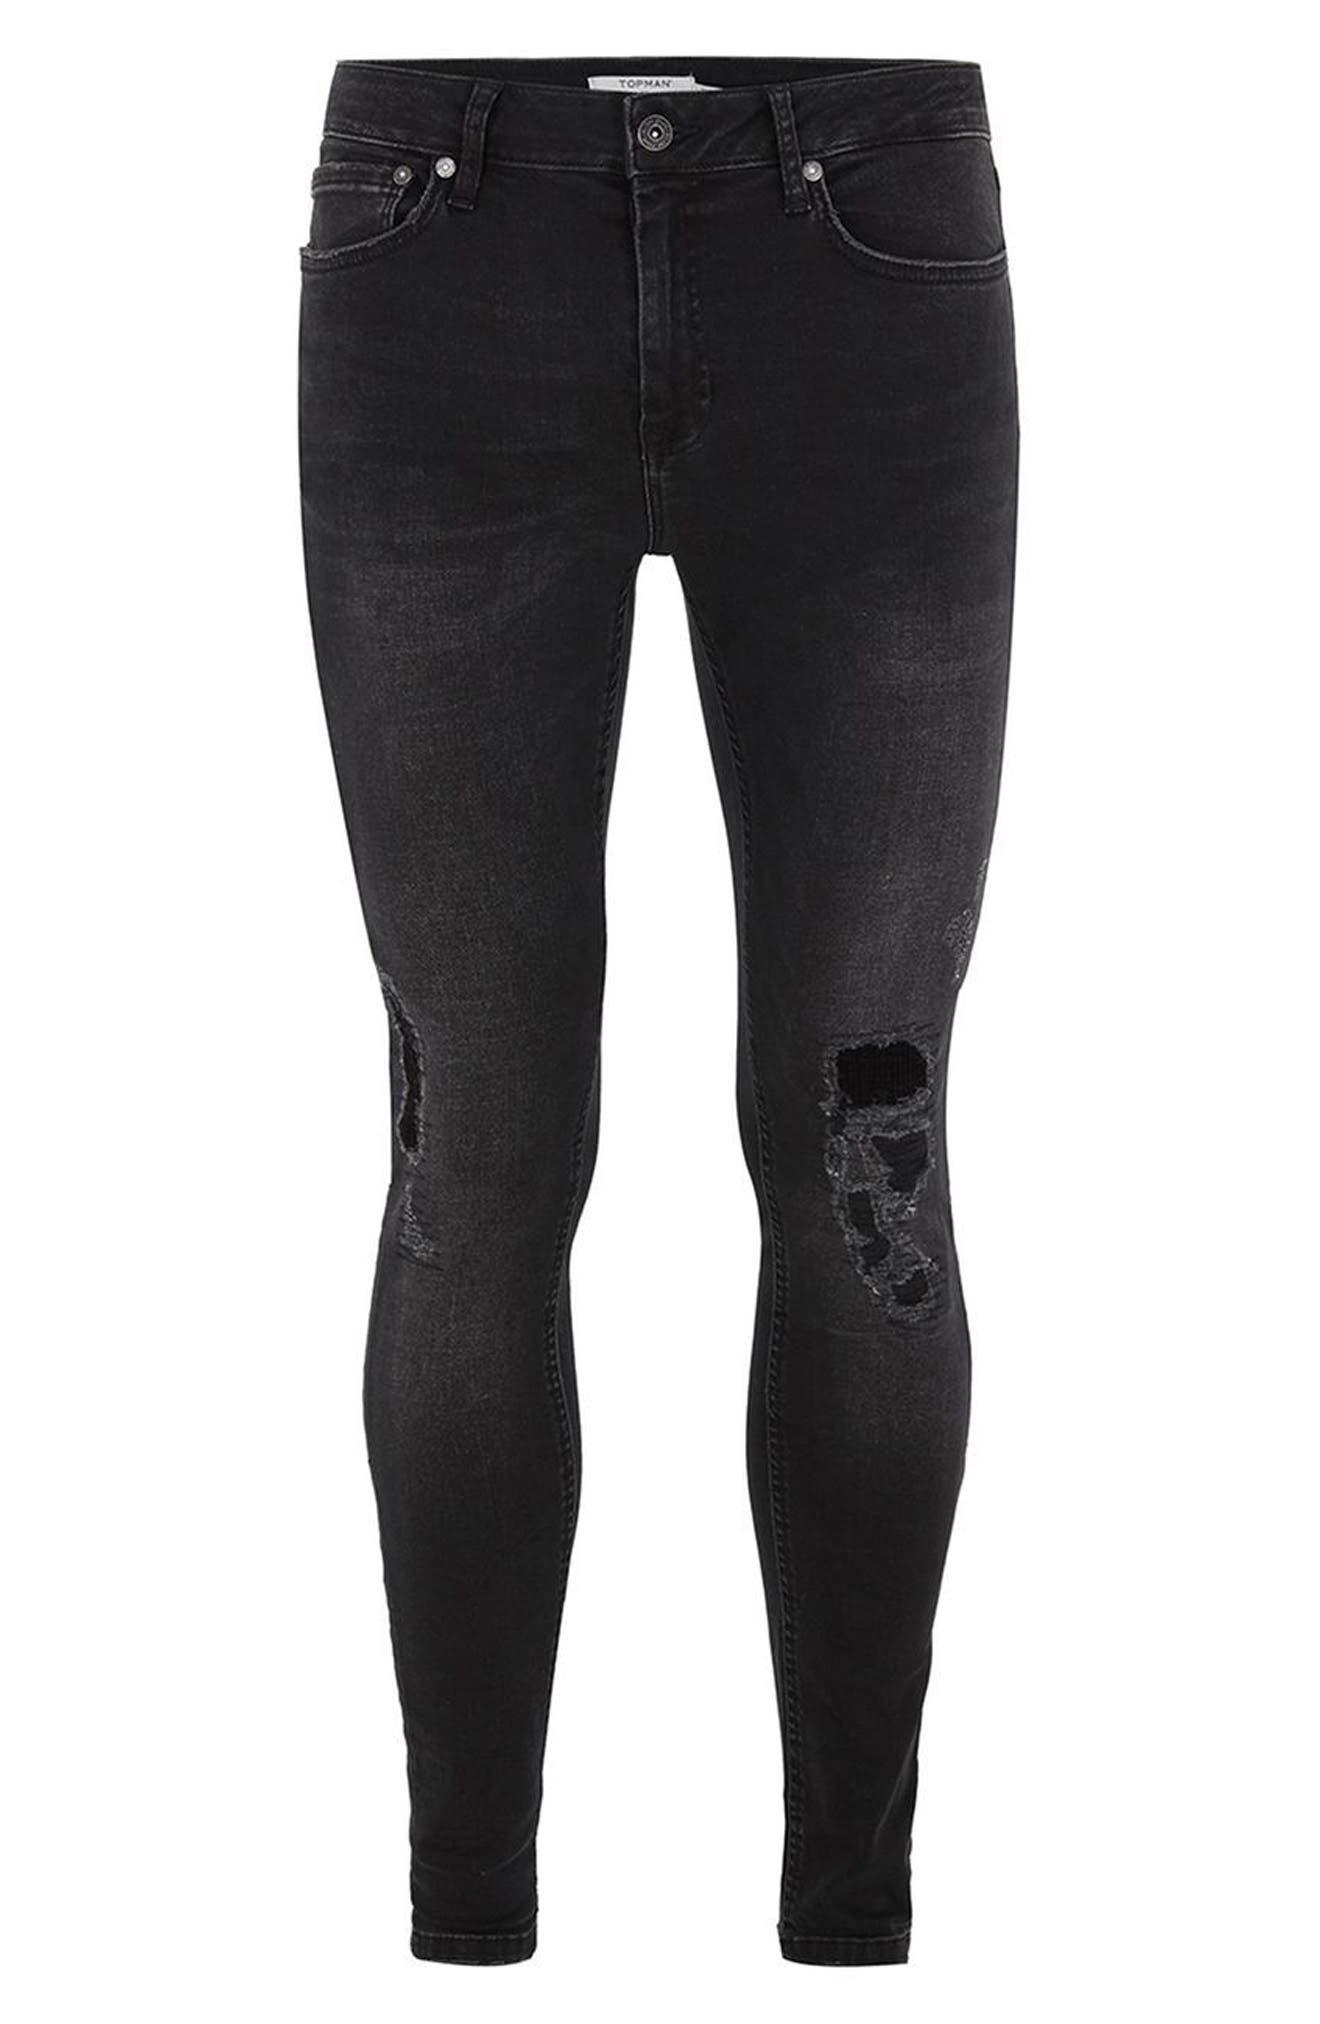 Repair Spray-On Skinny Fit Jeans,                             Alternate thumbnail 4, color,                             001